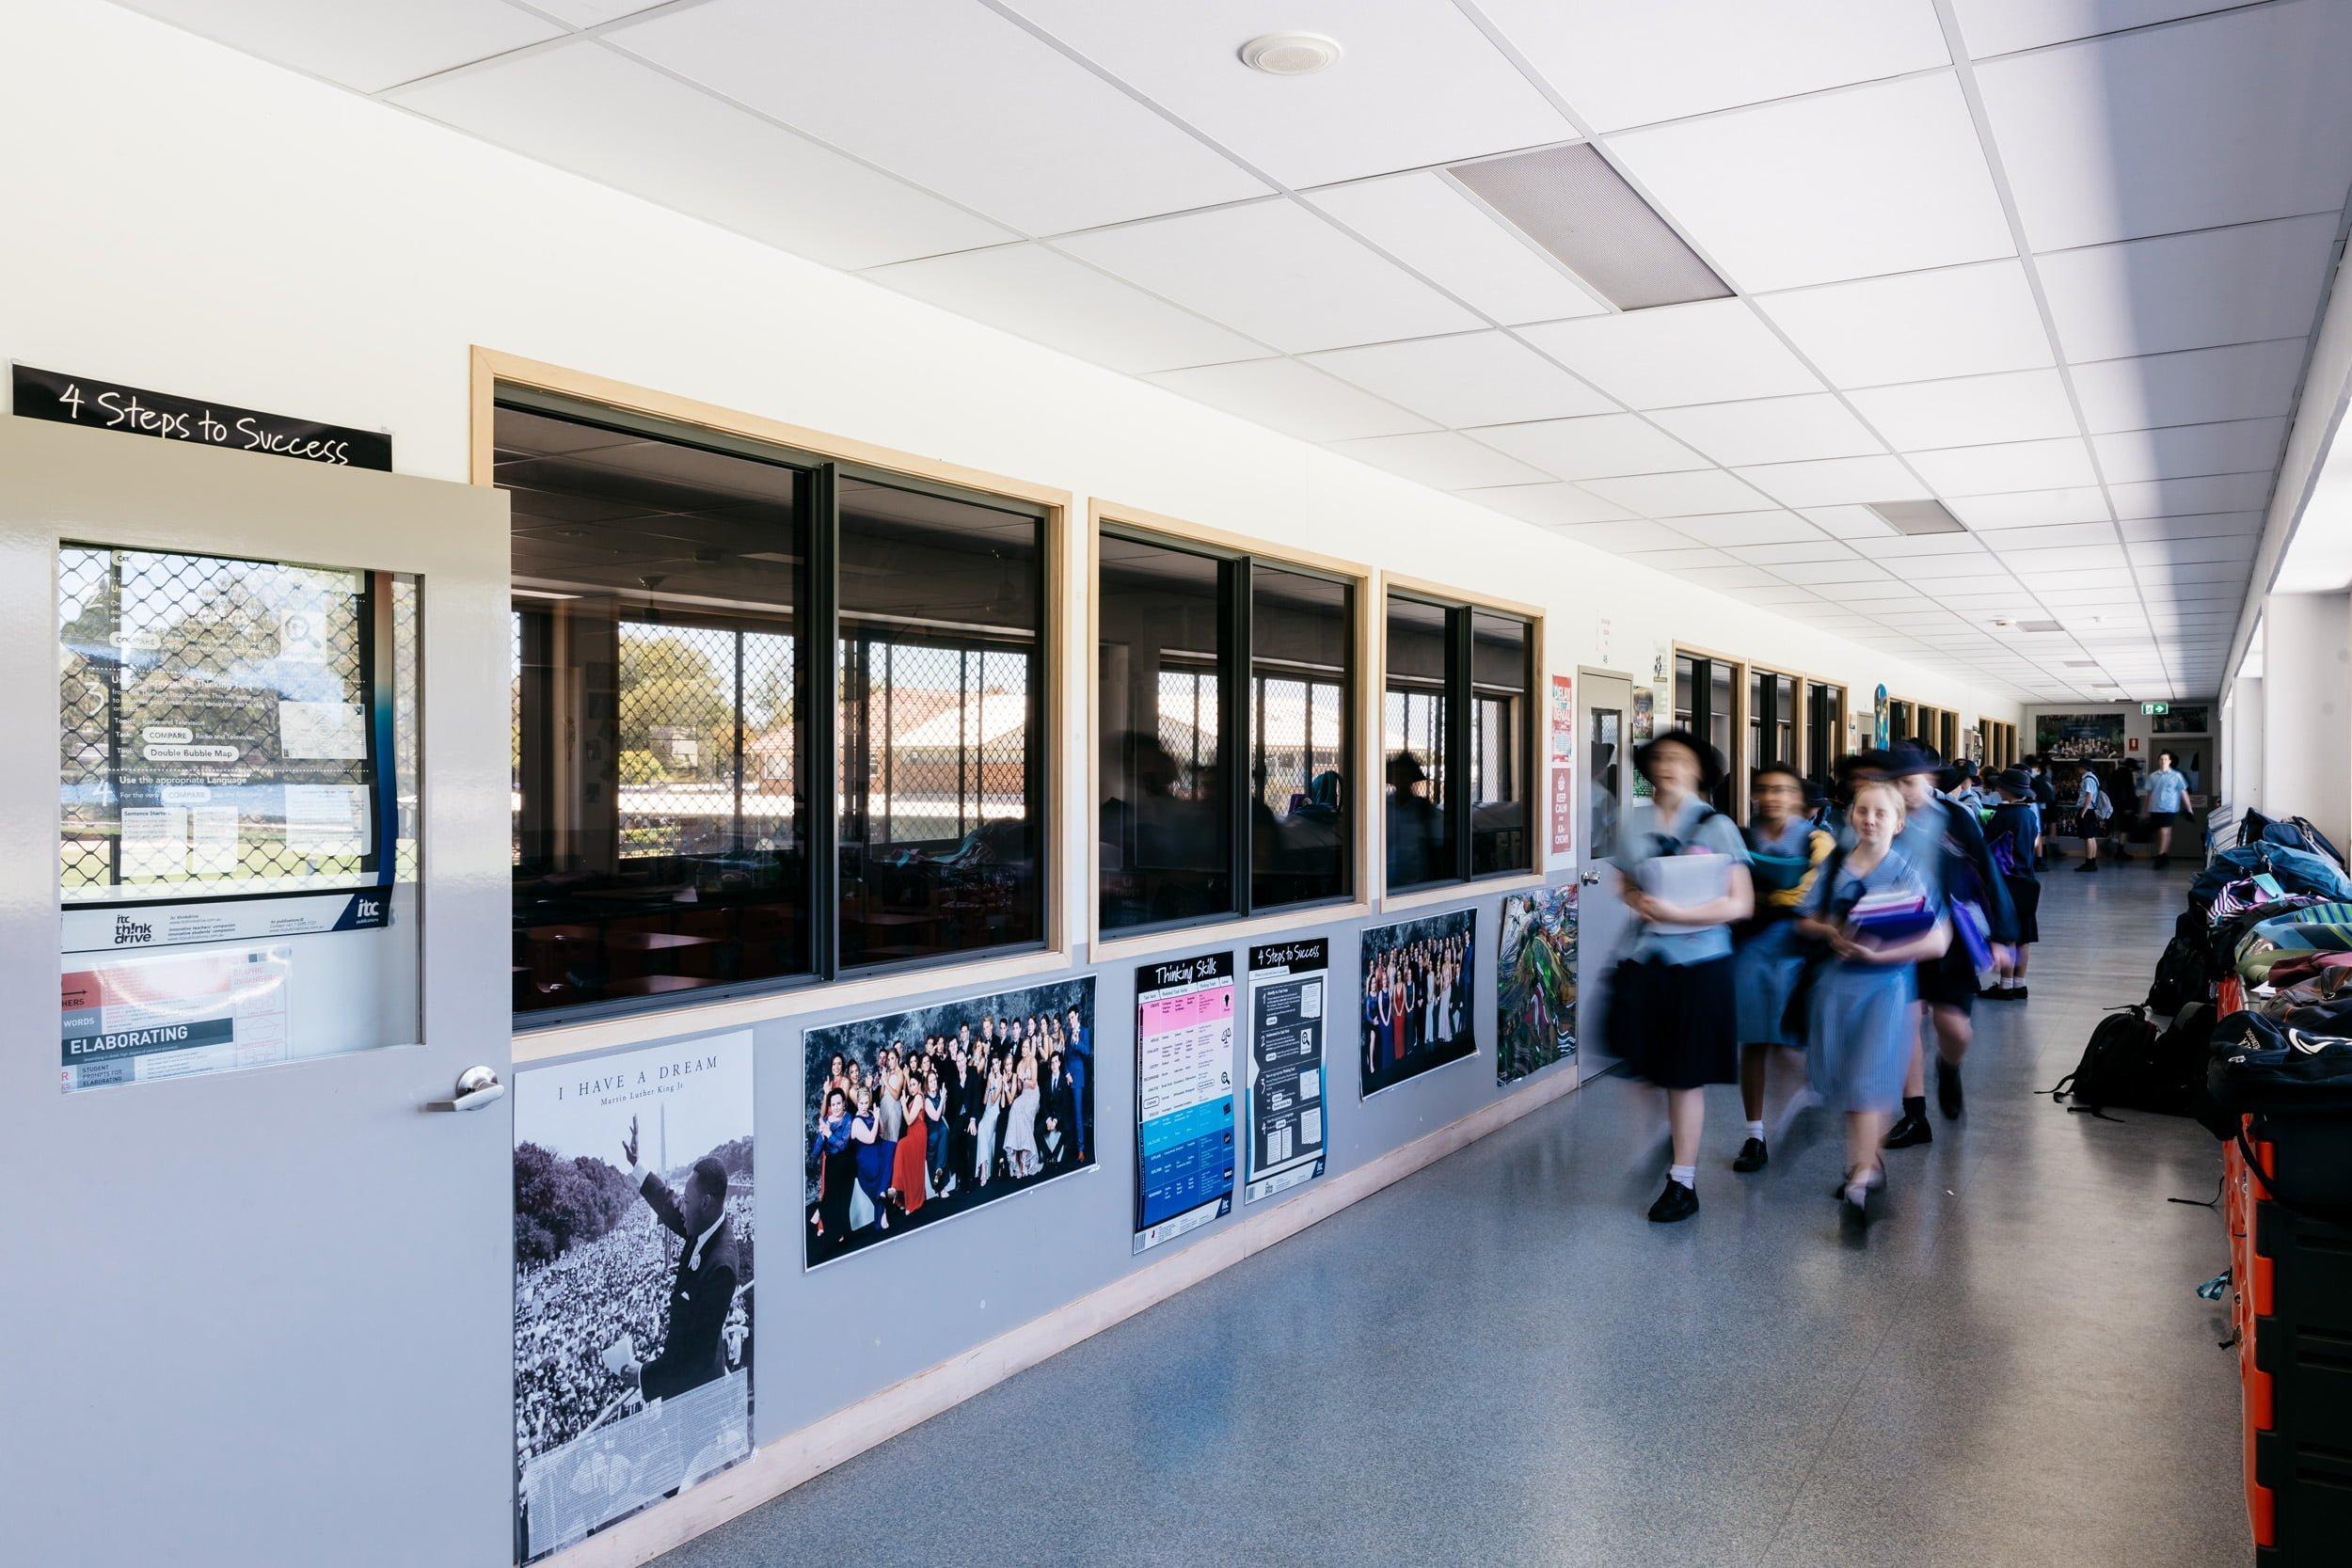 St Joseph's College Toowoomba